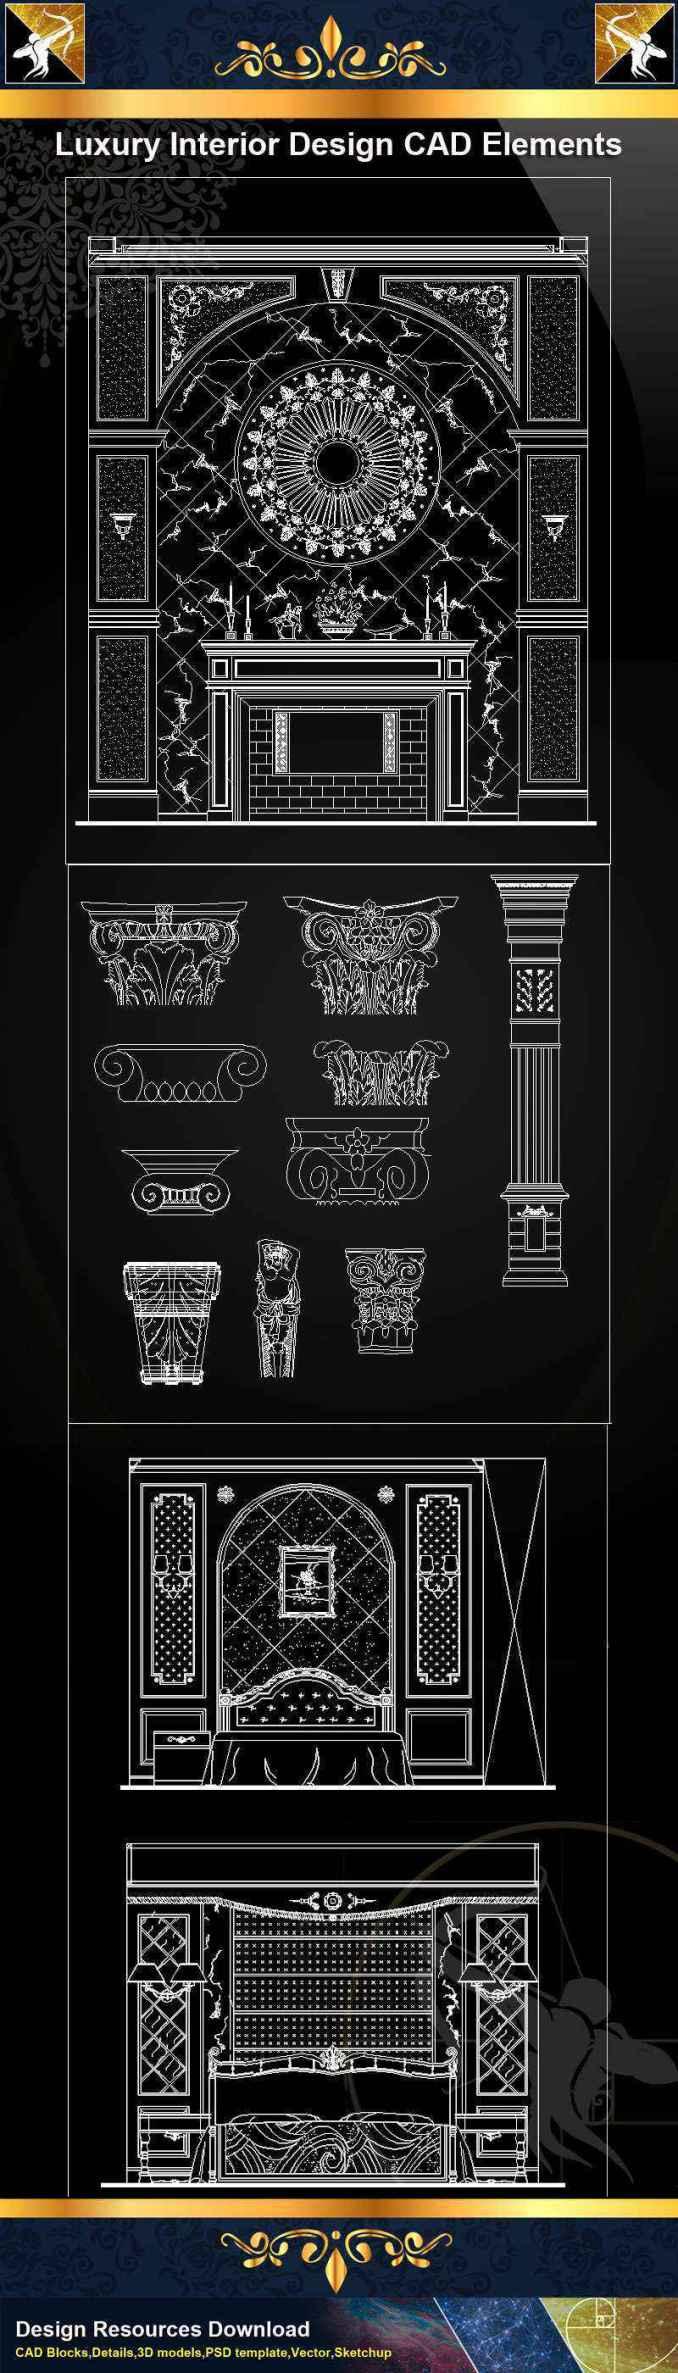 ★【Luxury Interior Design CAD Elements】@Autocad Decoration Blocks,Drawings,CAD Details,Elevation